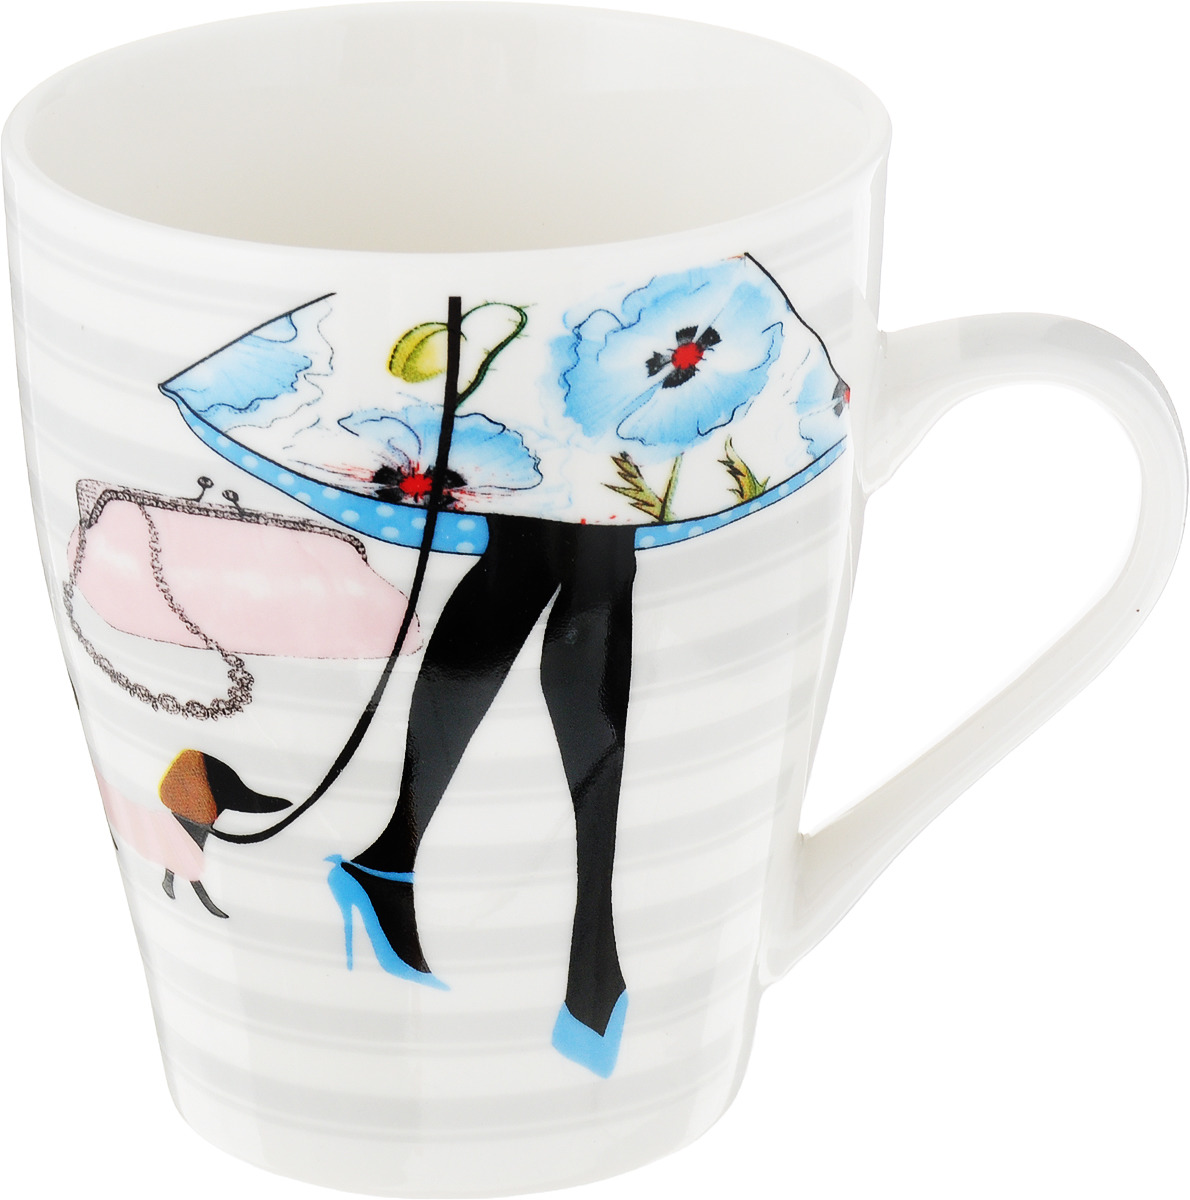 Кружка Loraine Fashion. Розовая сумочка, голубоые туфли, 340 мл. 223-3 кружка loraine цветы 340 мл мак